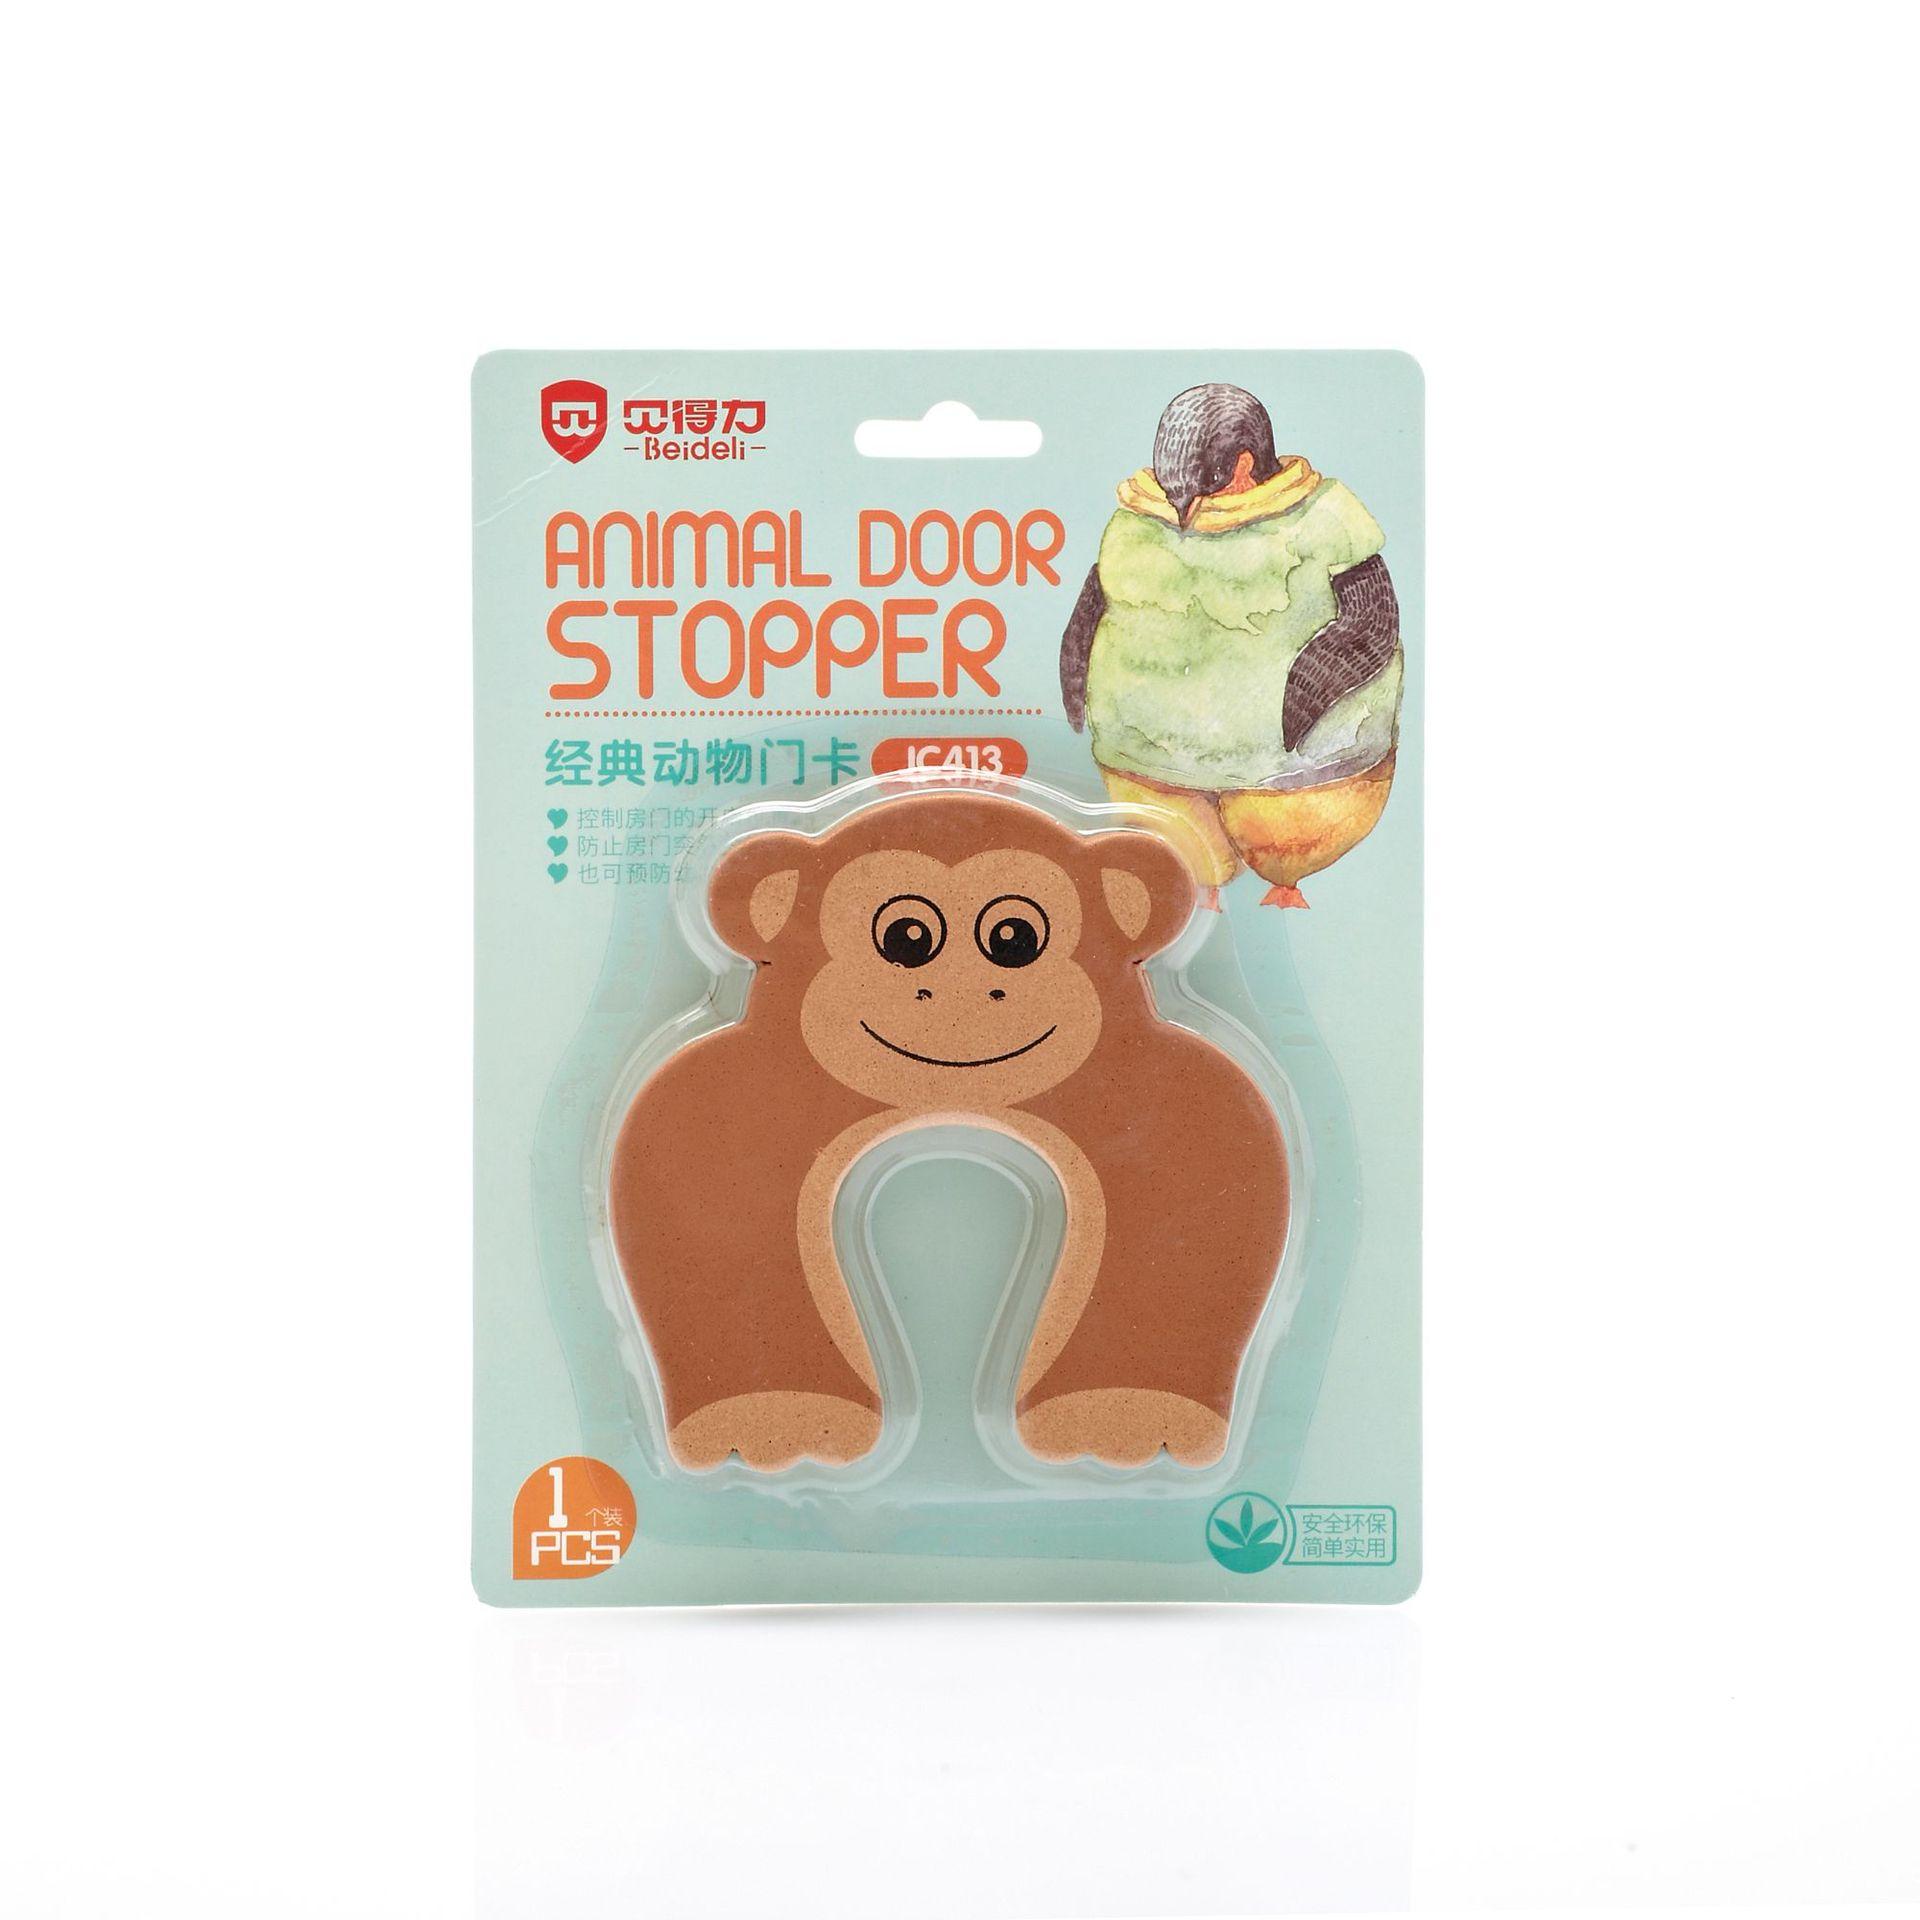 Beideli Bedsafe Children's Safety Products Baby EVA Animal Safety Door Cards